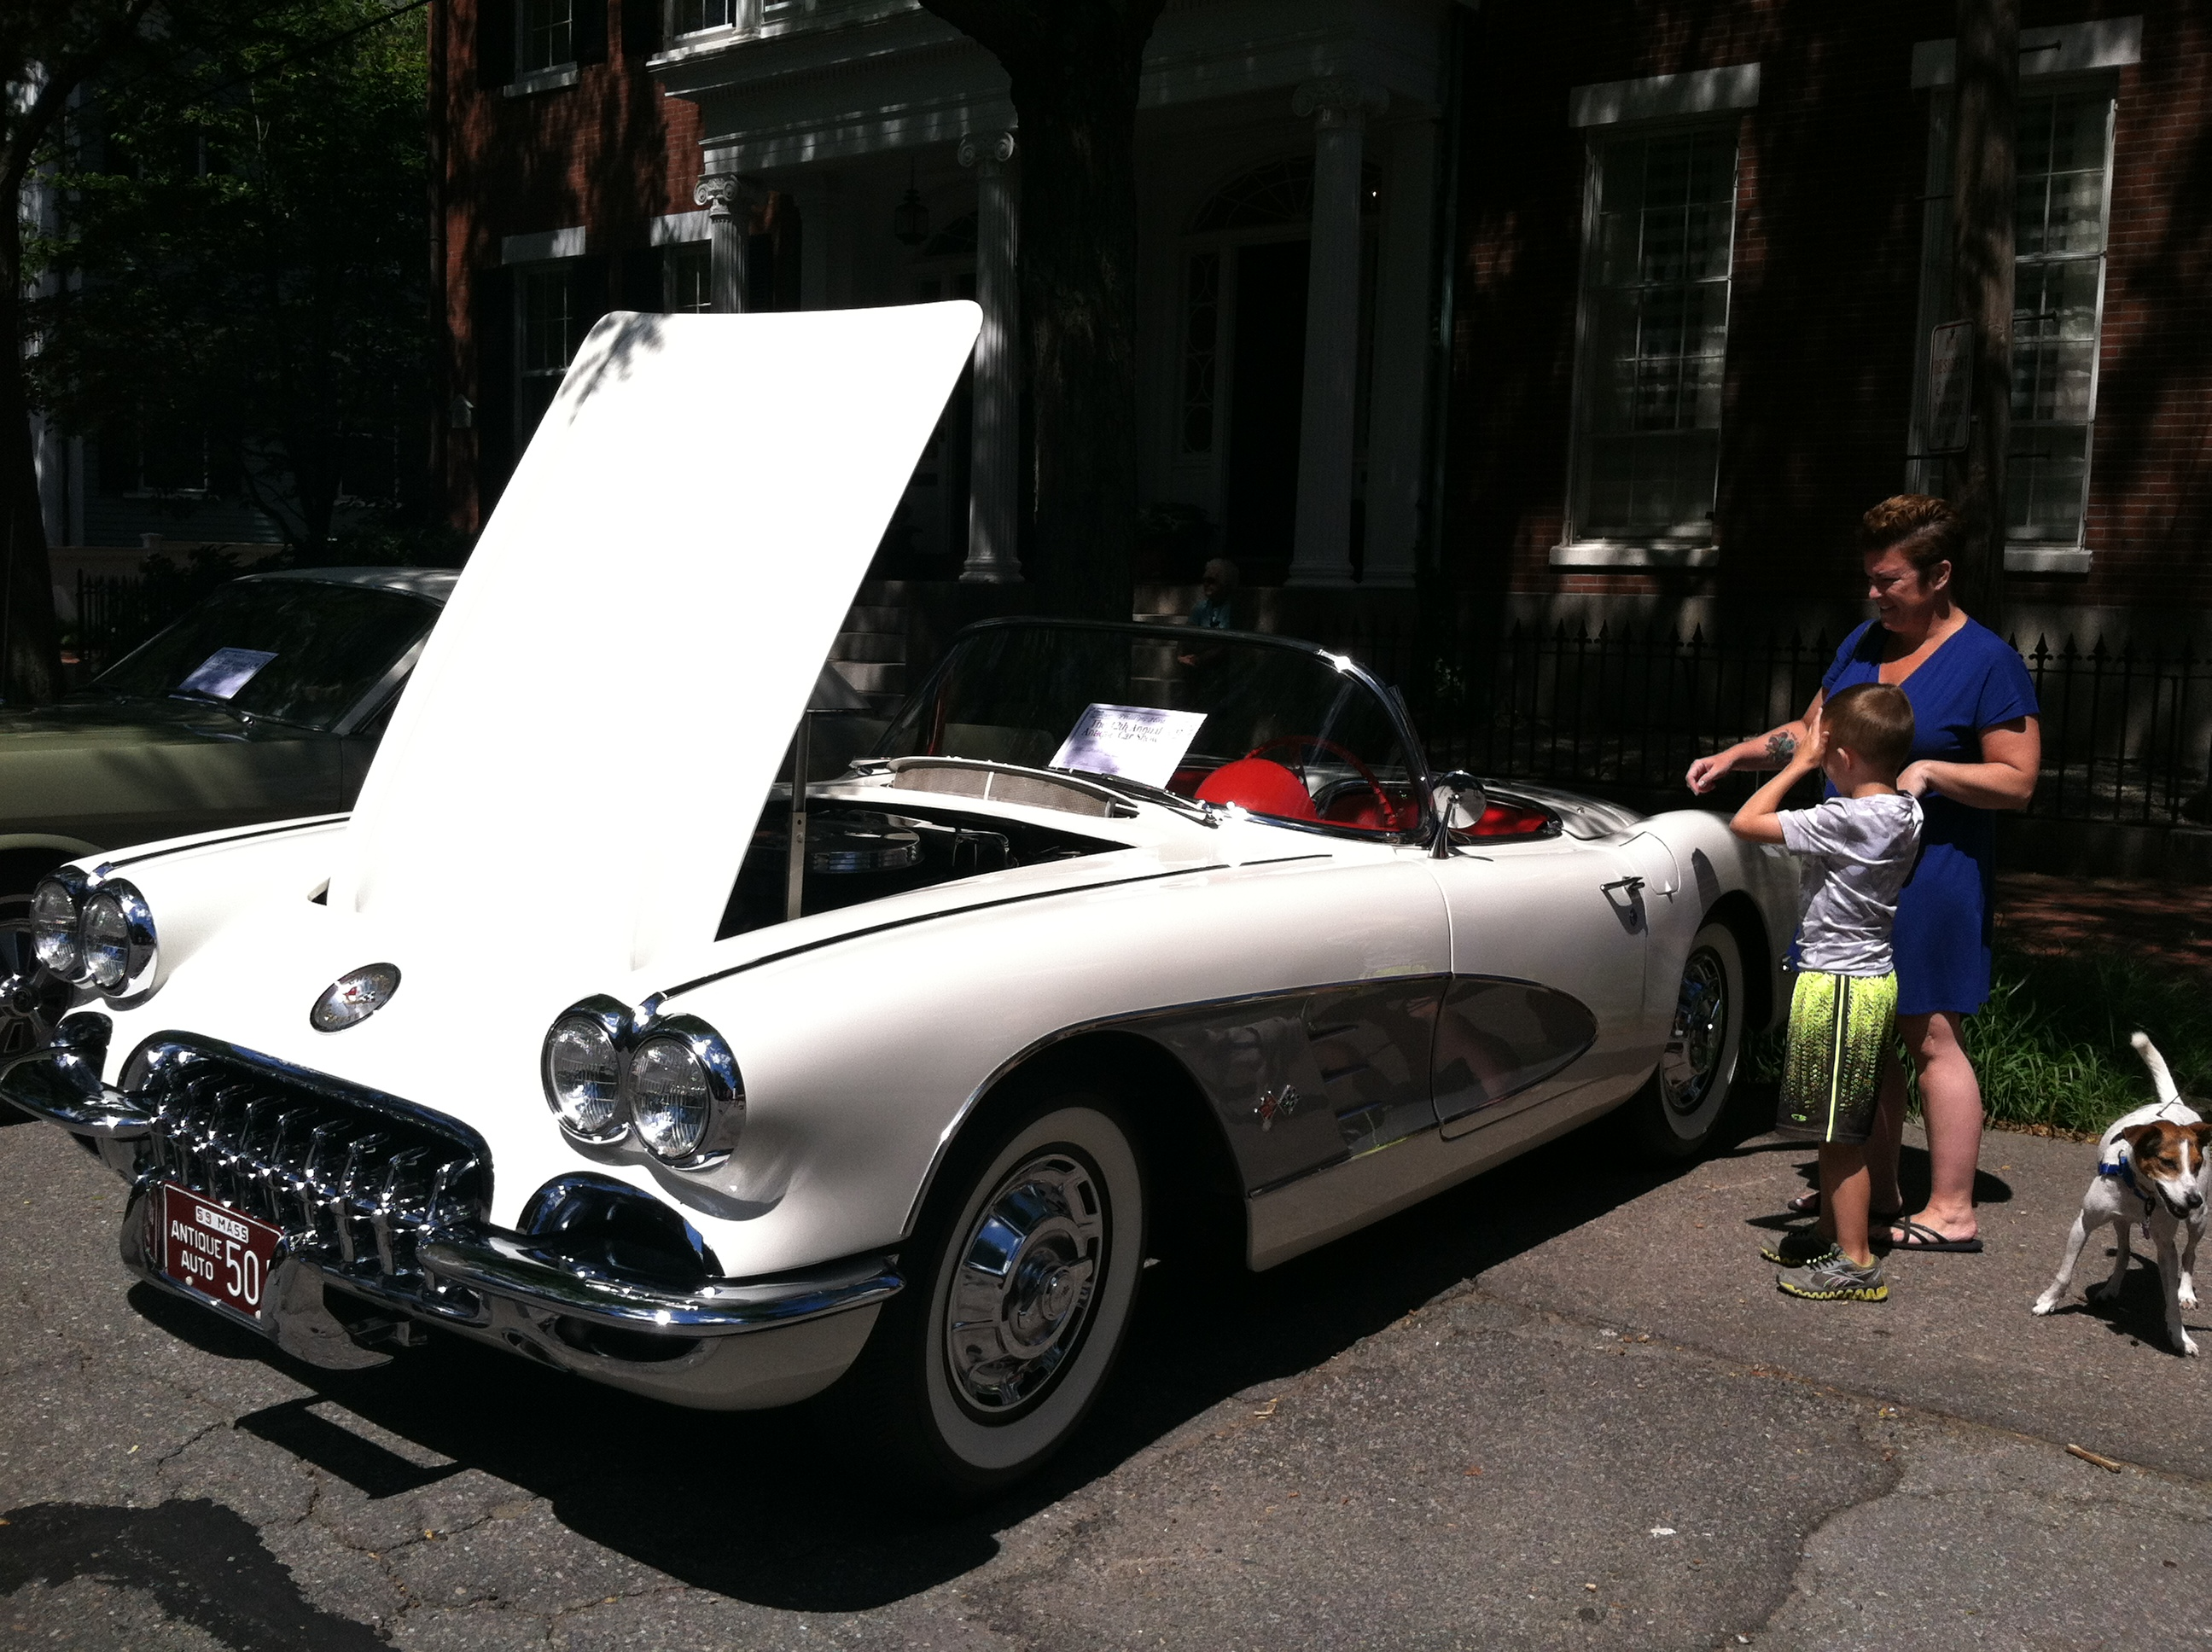 Salem, MA Vintage Cars, Aug 2013, CHedstrom